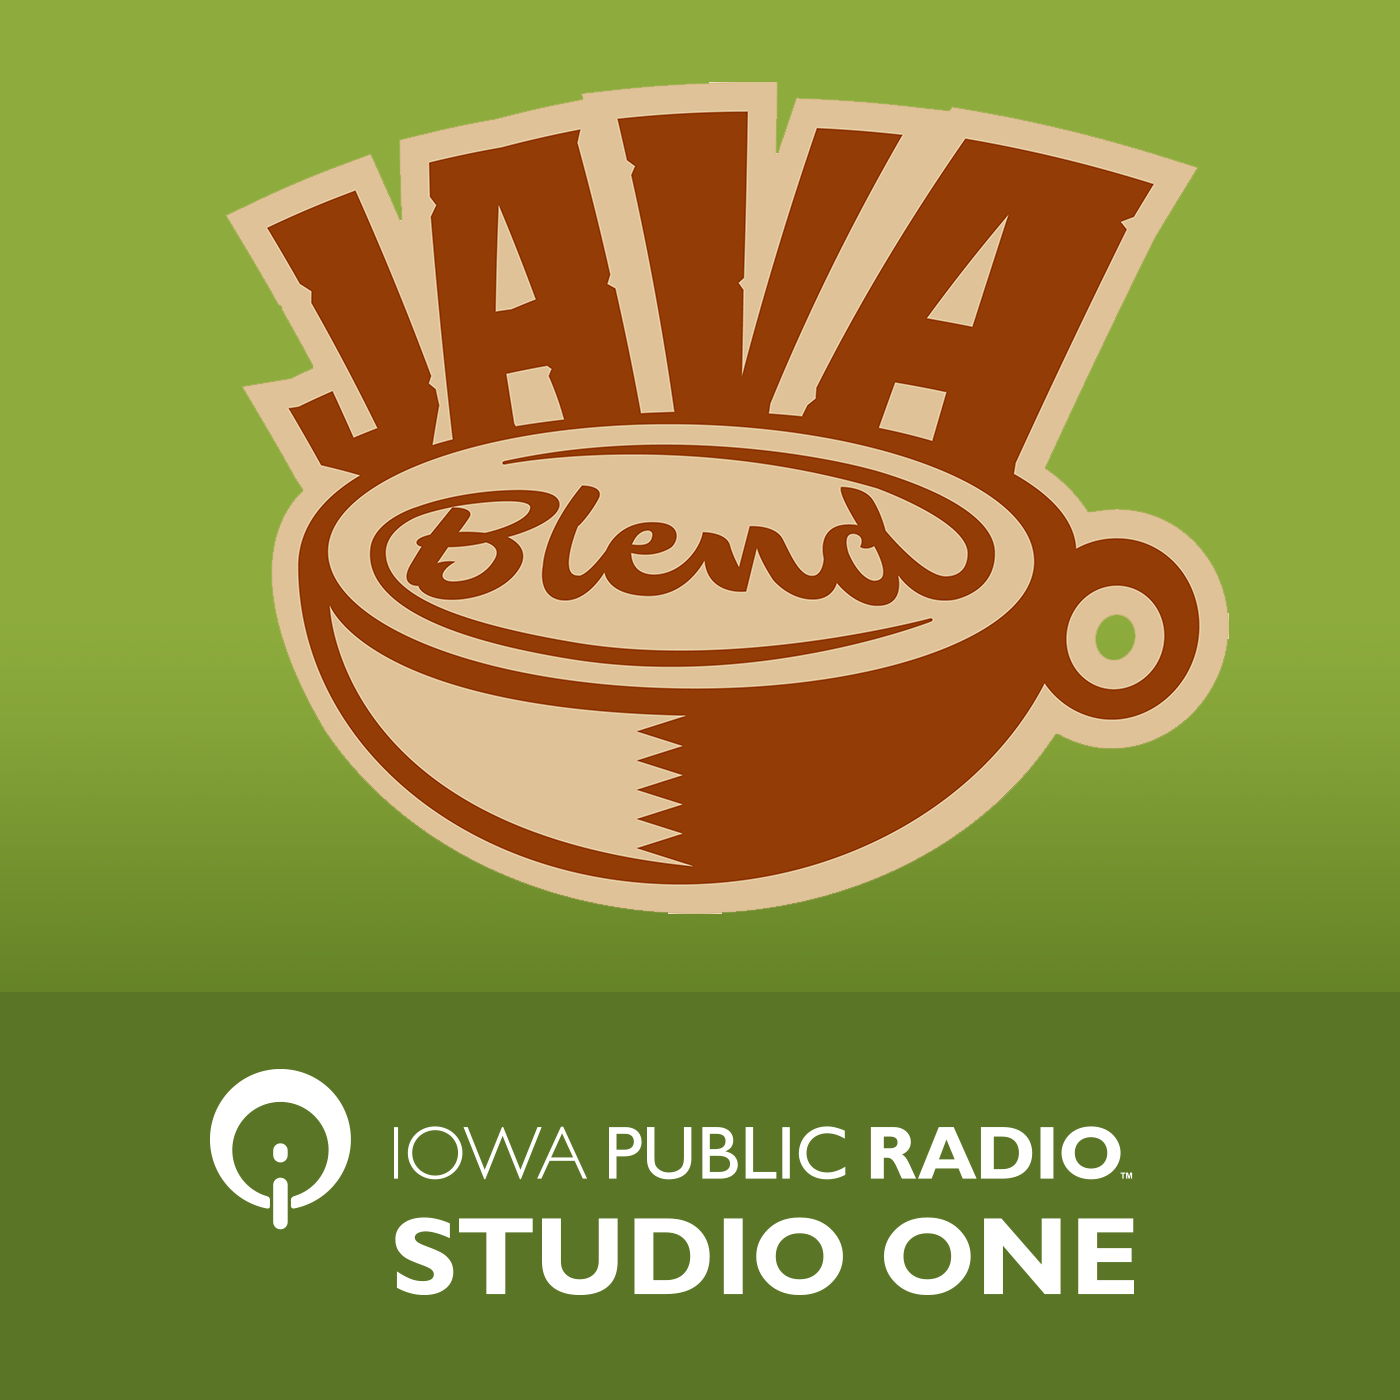 Java Blend